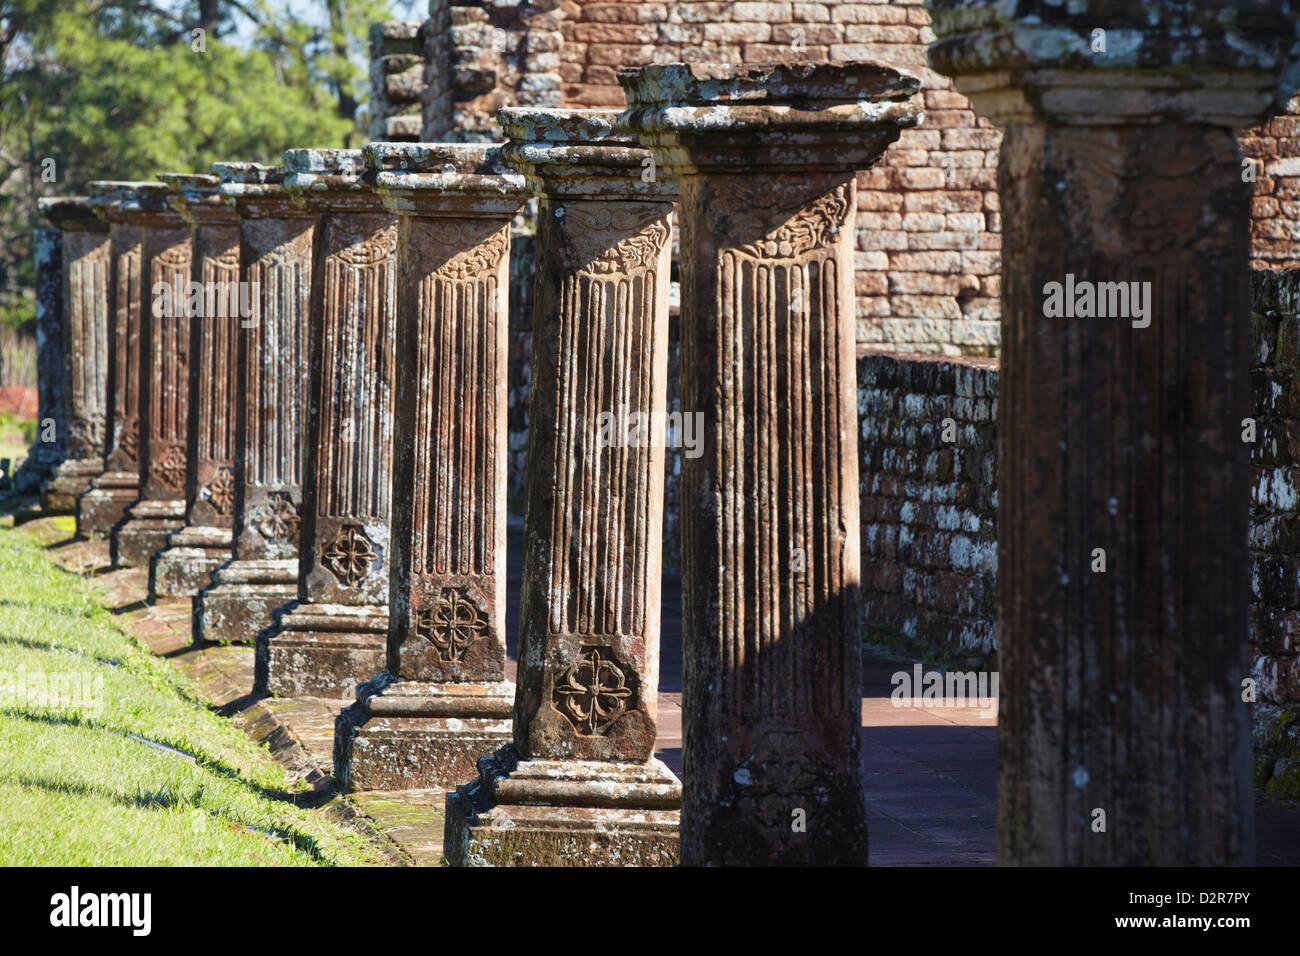 Ruins of Jesuit mission at Trinidad (La Santisima Trinidad de Parana), Parana Plateau, Paraguay - Stock Image